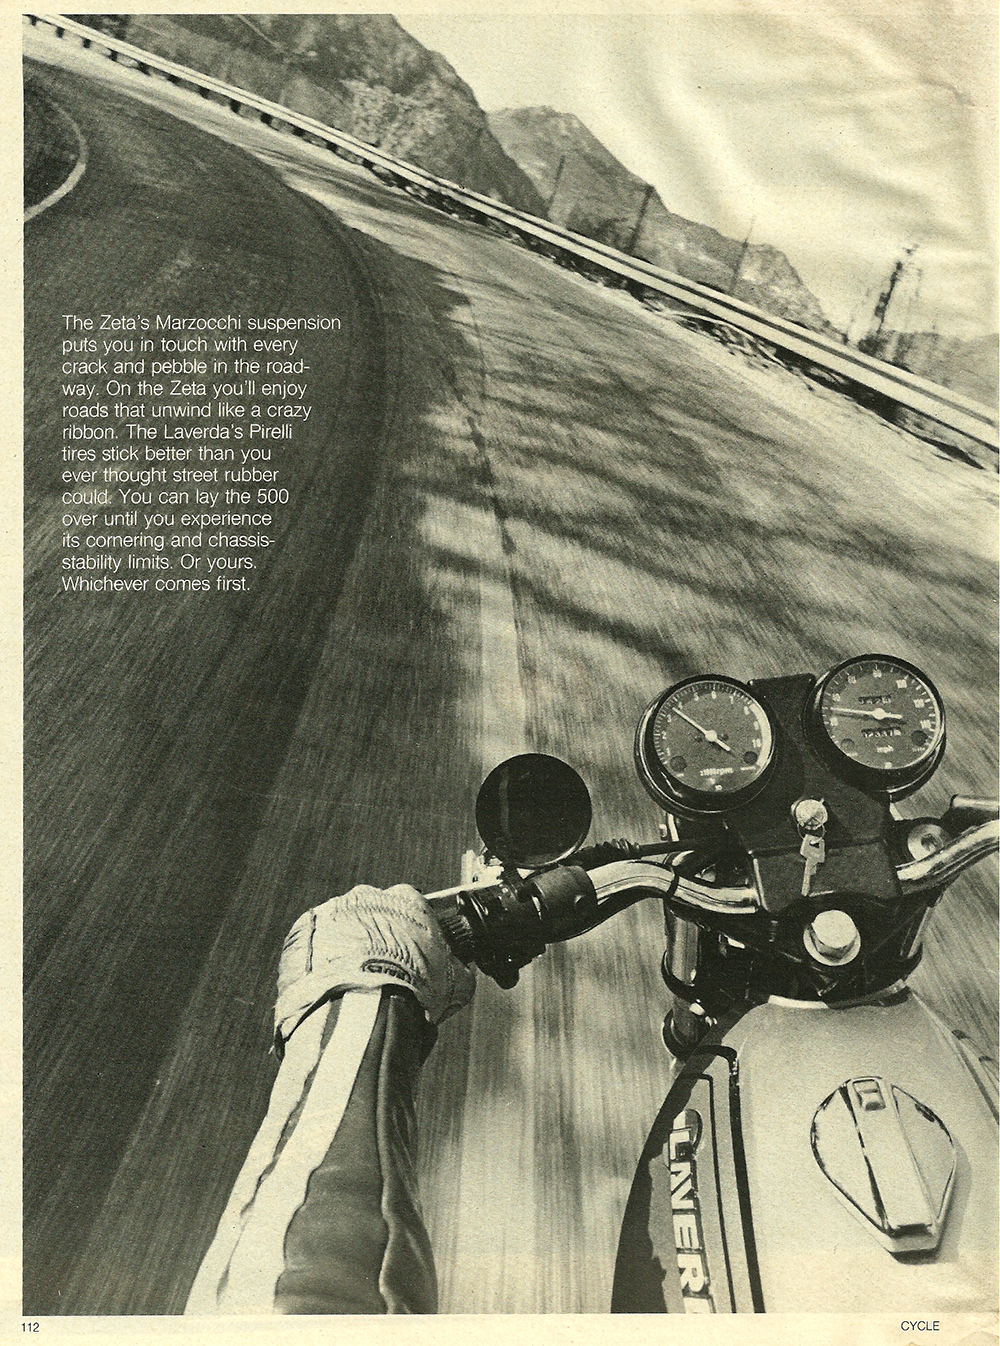 1979 Laverda 500 Zeta road test 3.jpg